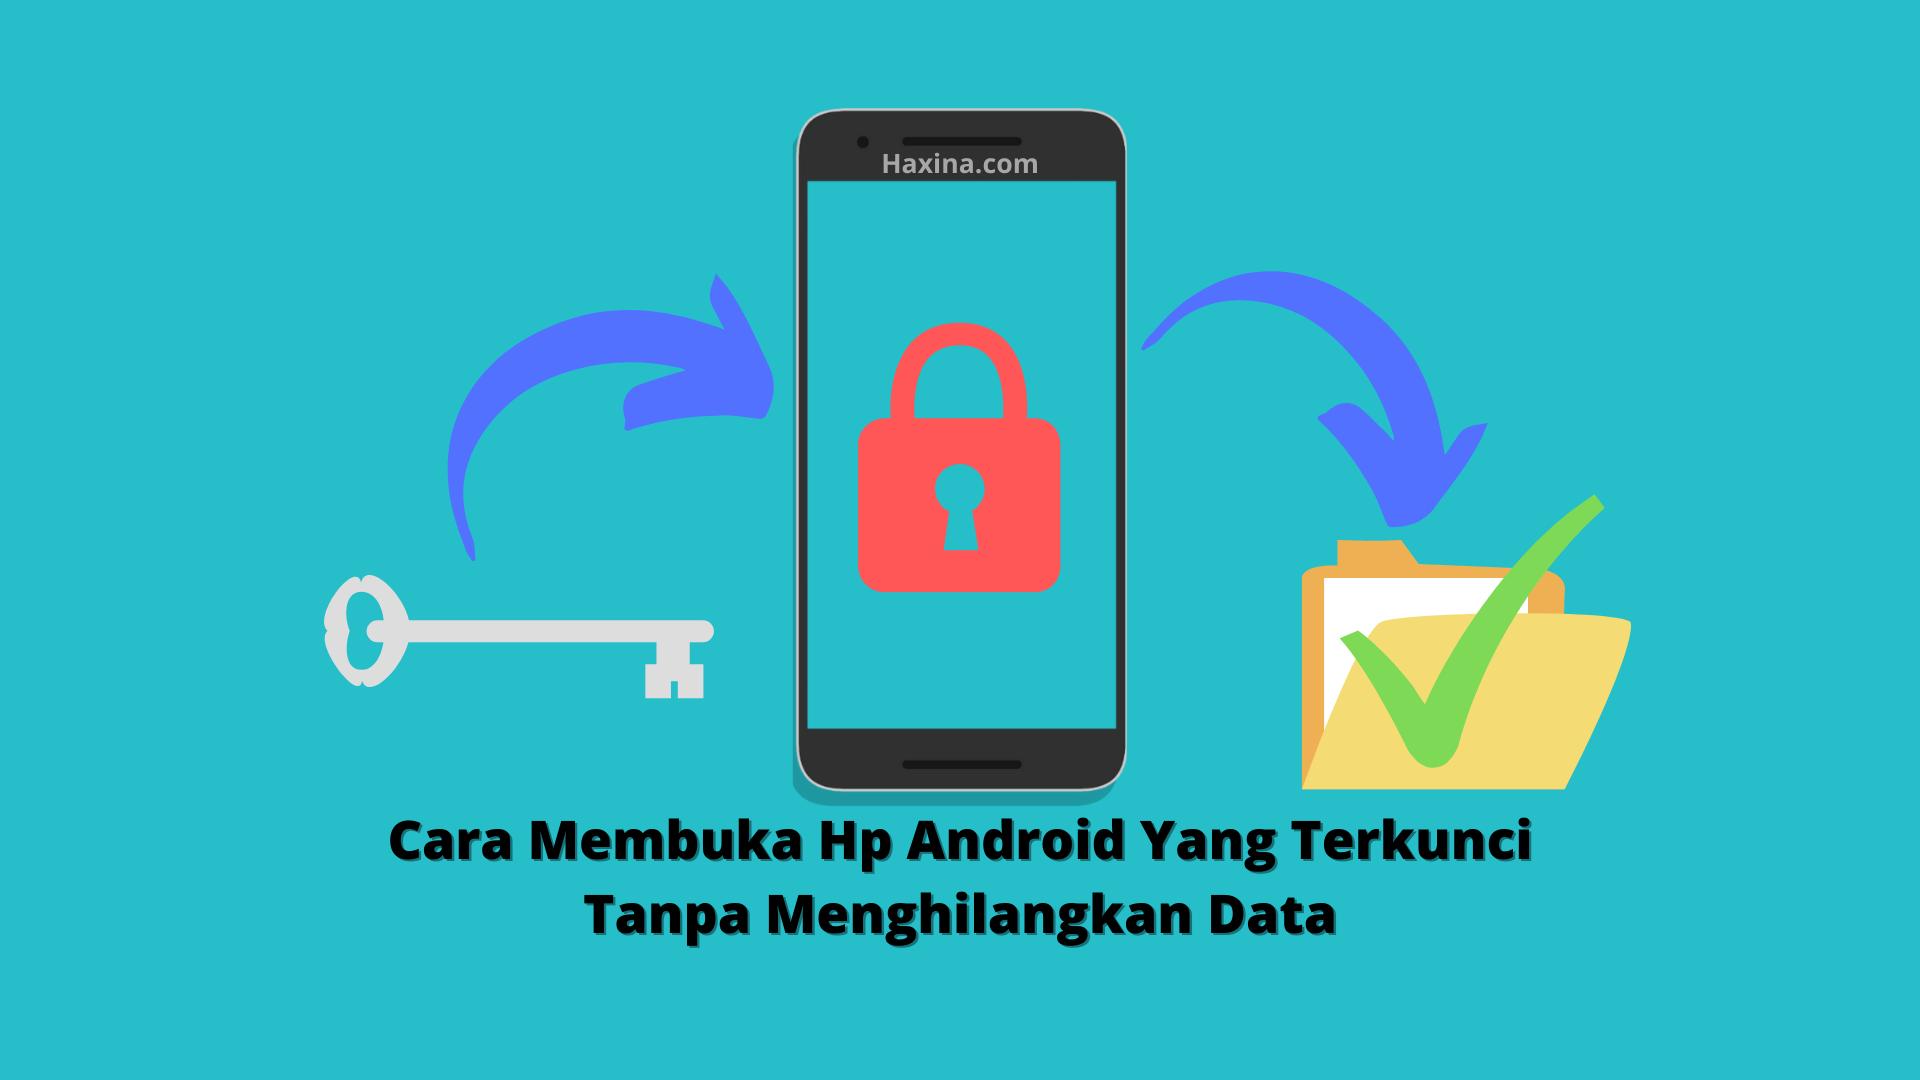 Cara Membuka Hp Android Yang Terkunci Tanpa Menghilangkan Data